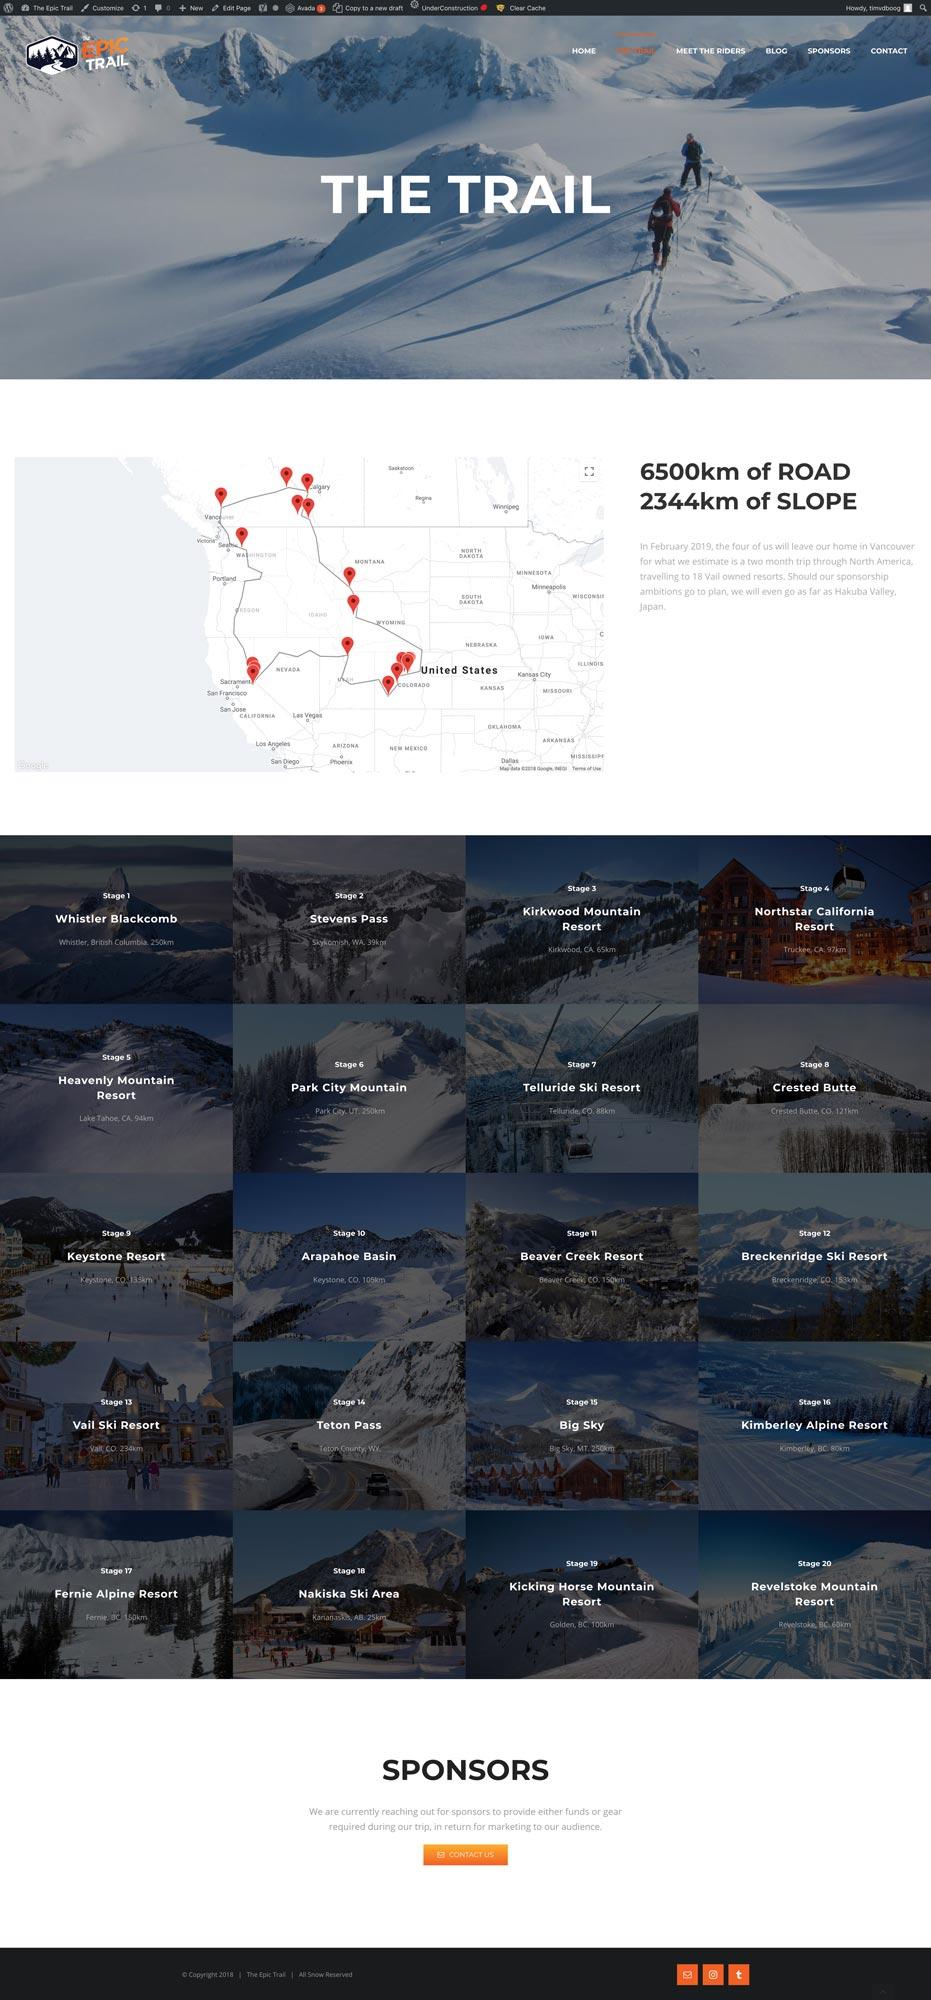 Webdevelopment Epic Trail.ski Tim van den Boog TIMIT